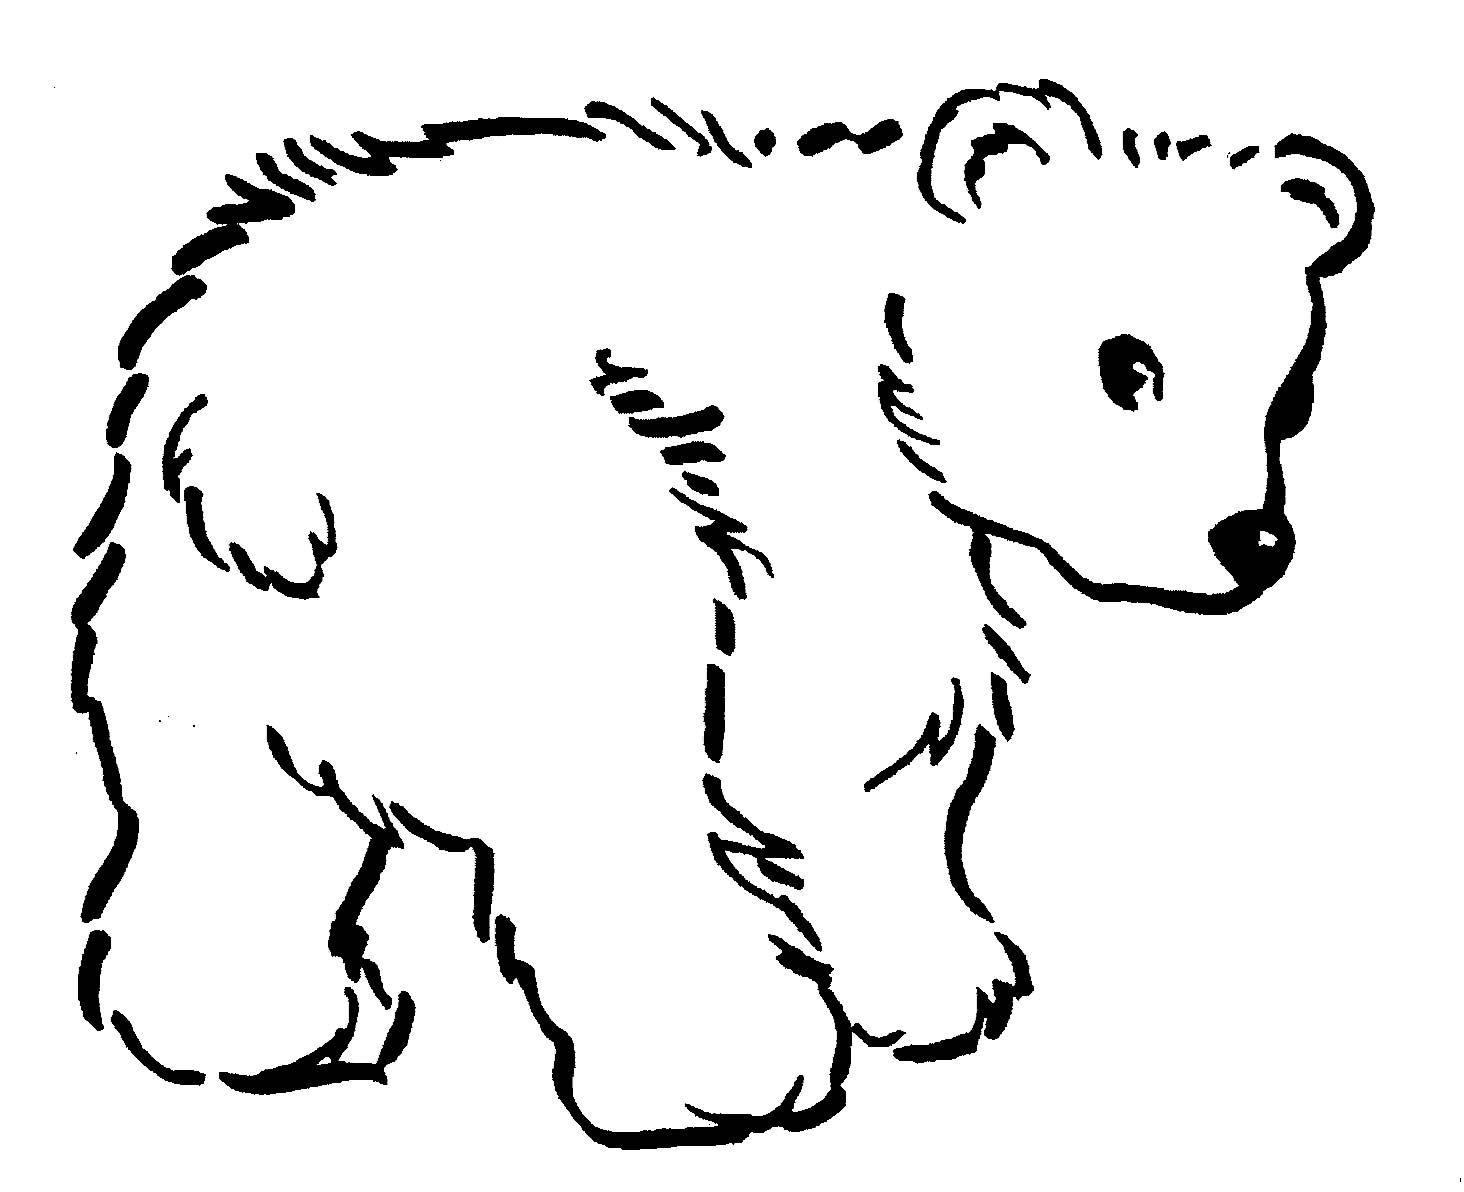 arctic animal silhouettes - Google Search | dzivnieki | Pinterest ...